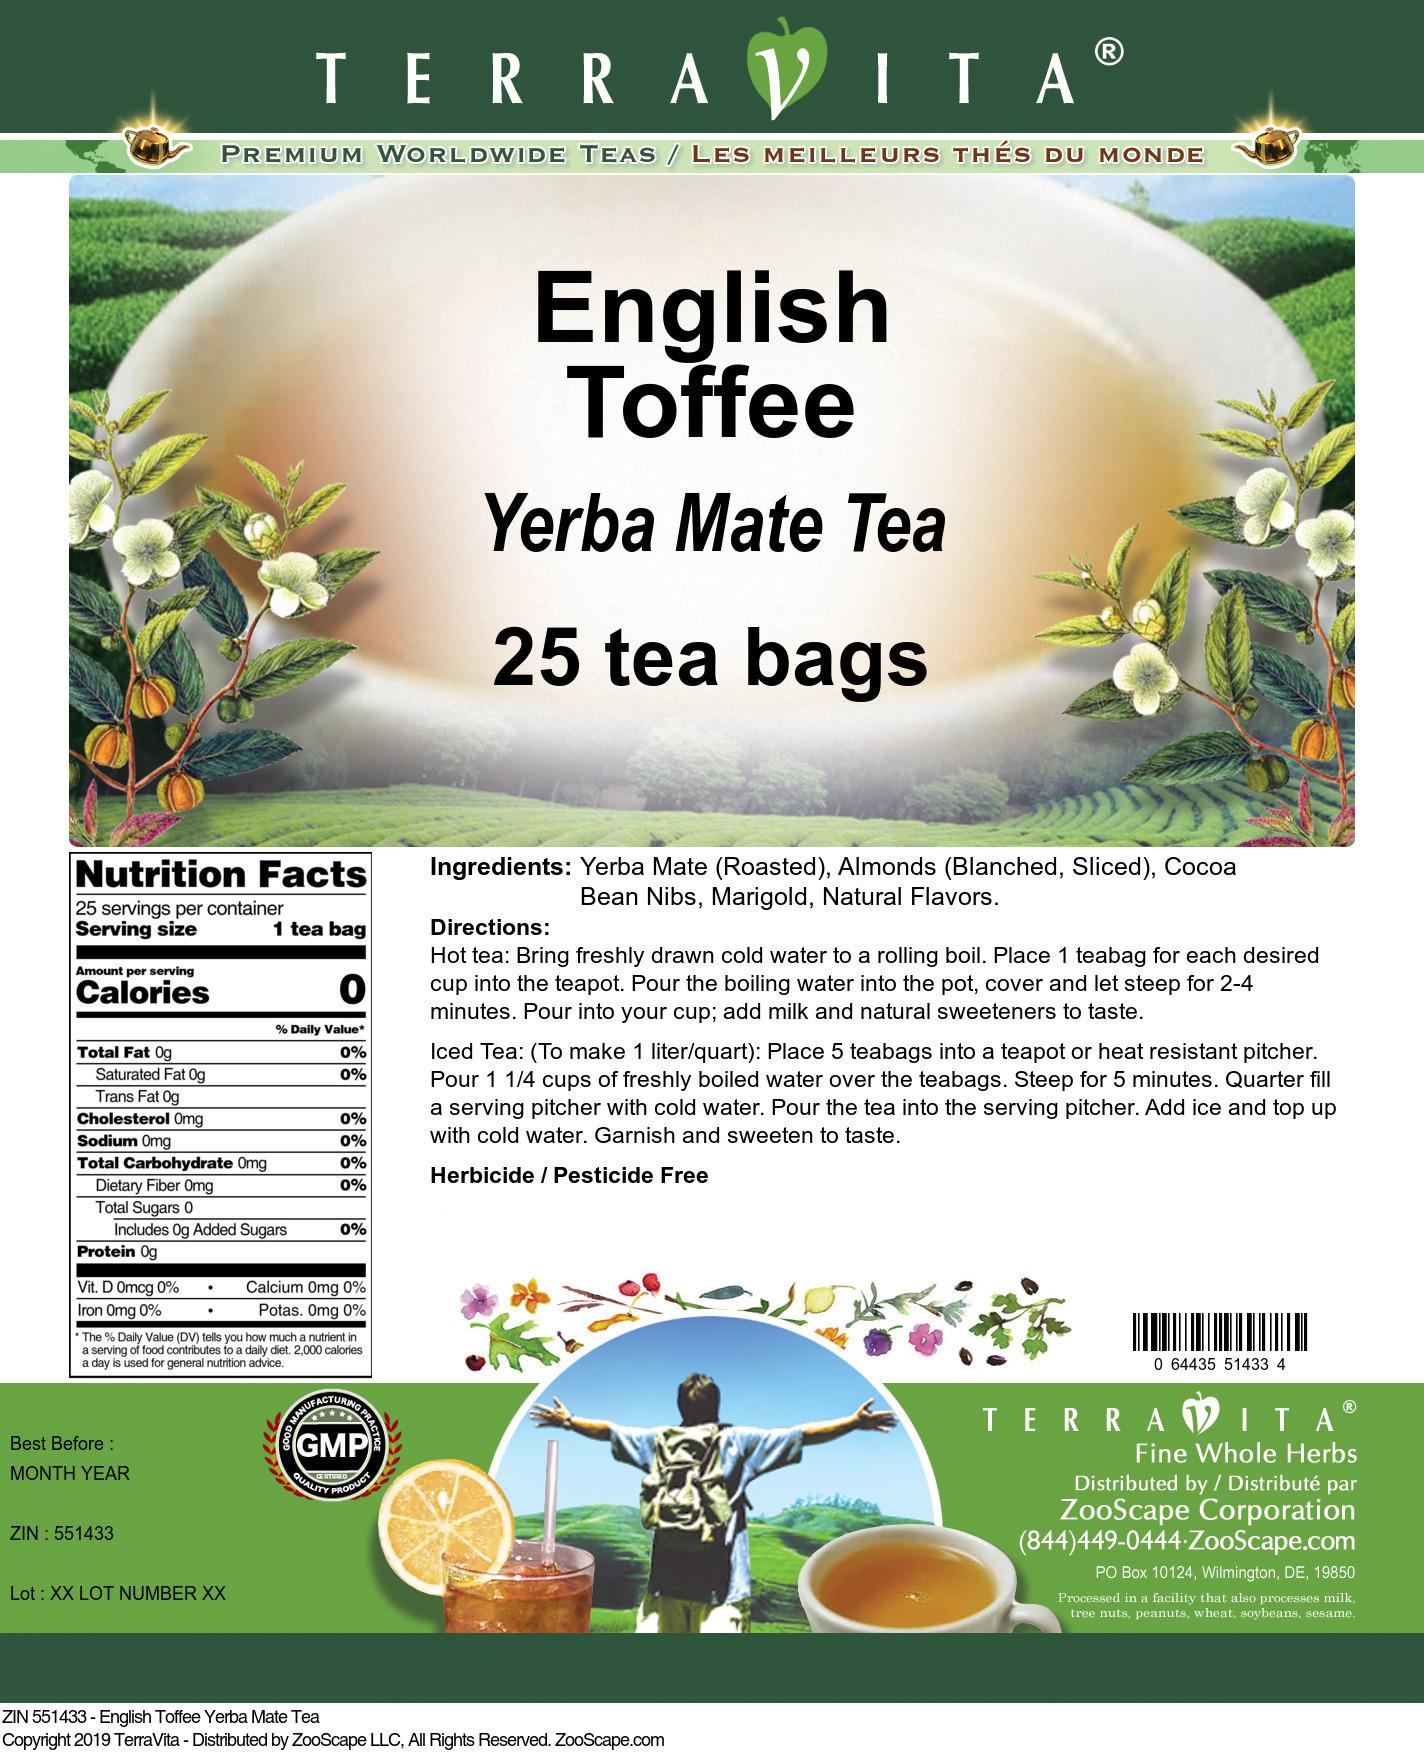 English Toffee Yerba Mate